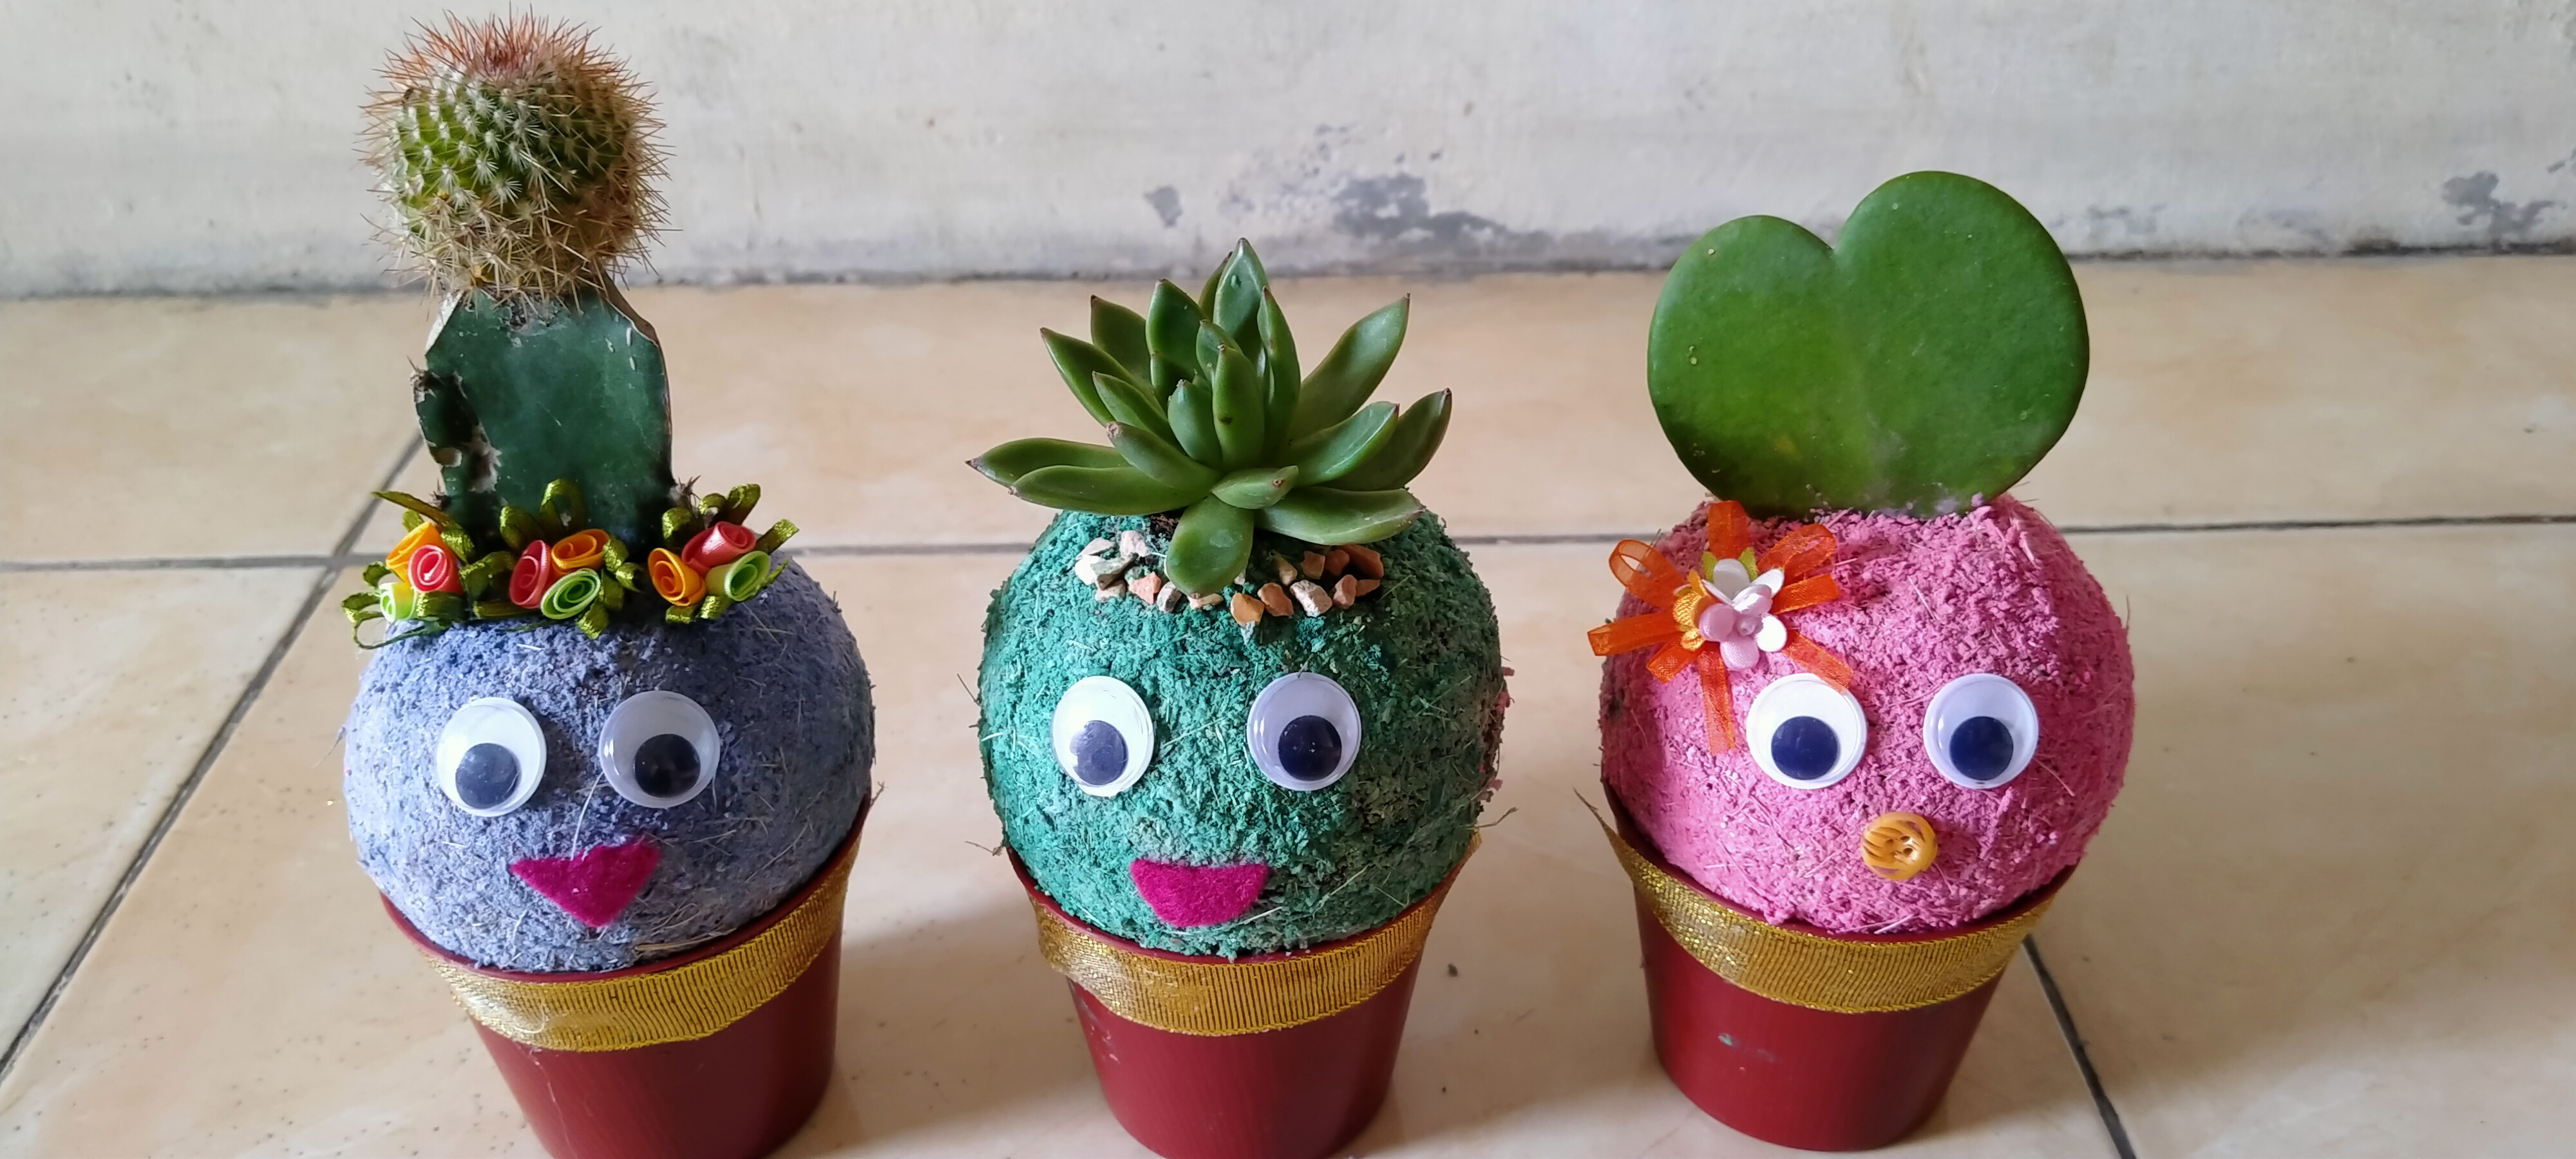 Tampilan produk Lek Lumut yang dapat dijadikan sebagai tanaman hias, souvenir pernikahan, ataupun hadiah wisuda.  (Sumber foto: Lek Lumut)